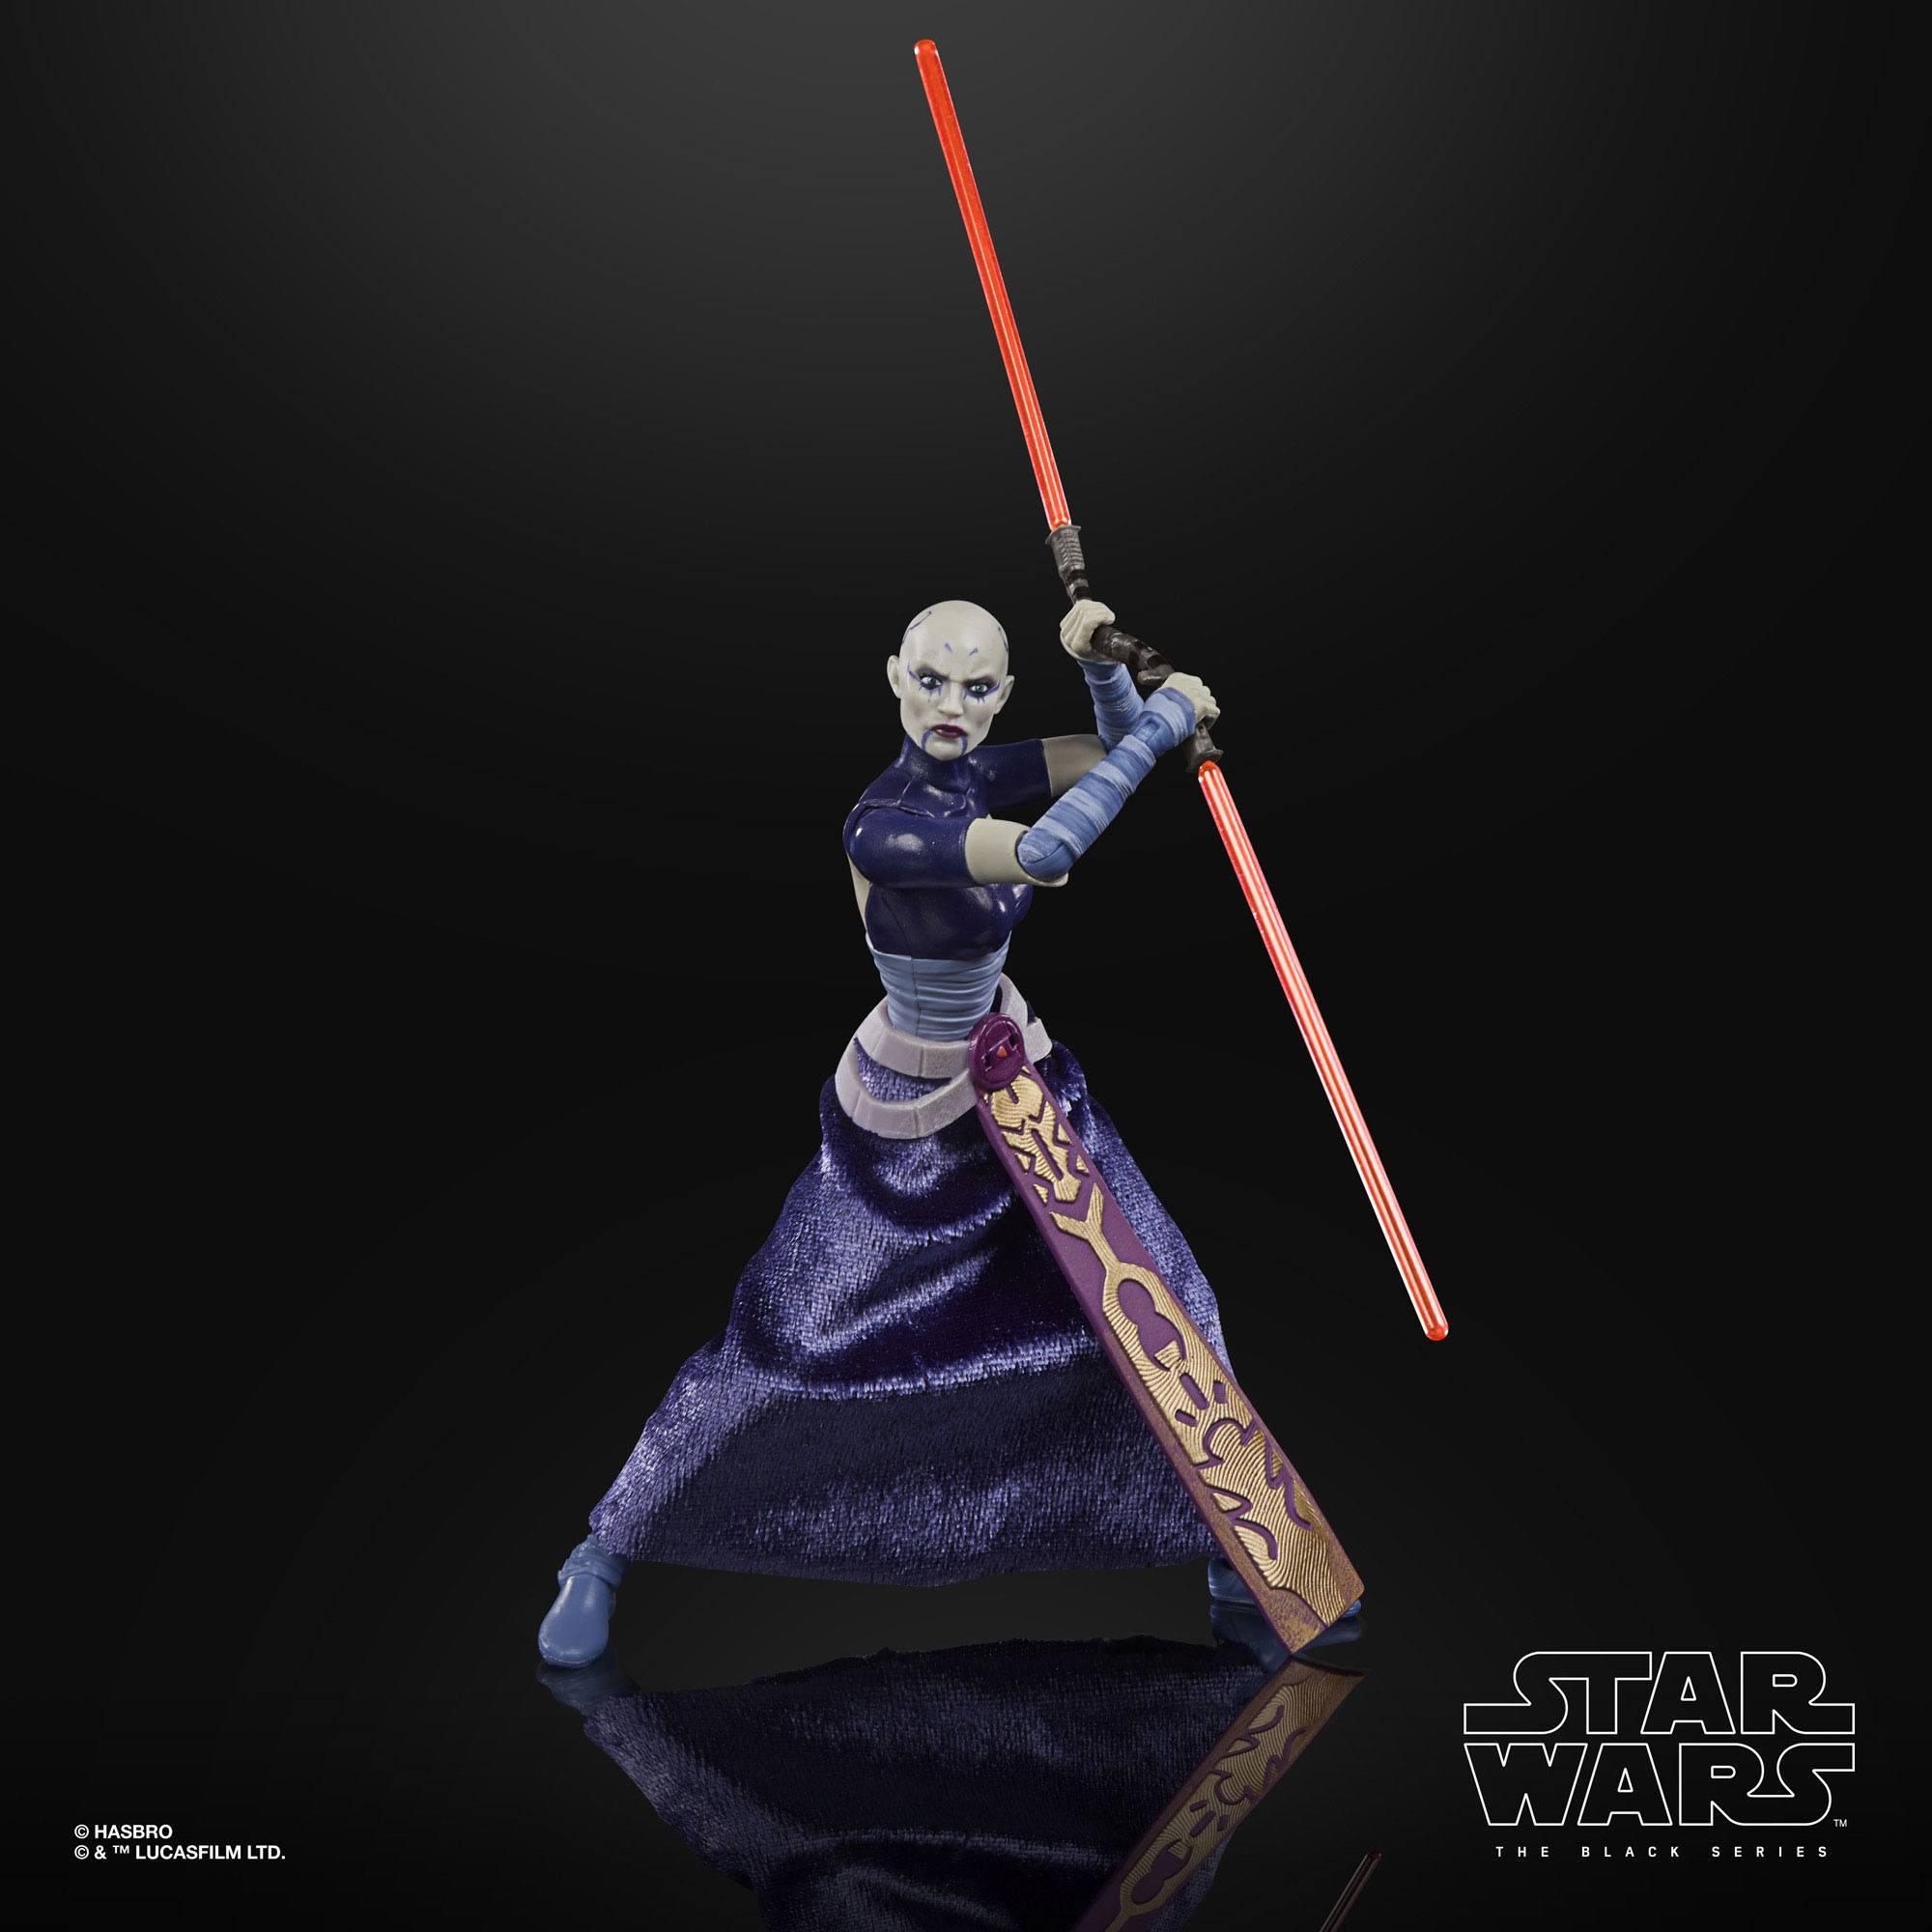 Star Wars The Black Series Asajj Ventress (The Clone Wars) 15cm Actionfigur F1861 5010993813391